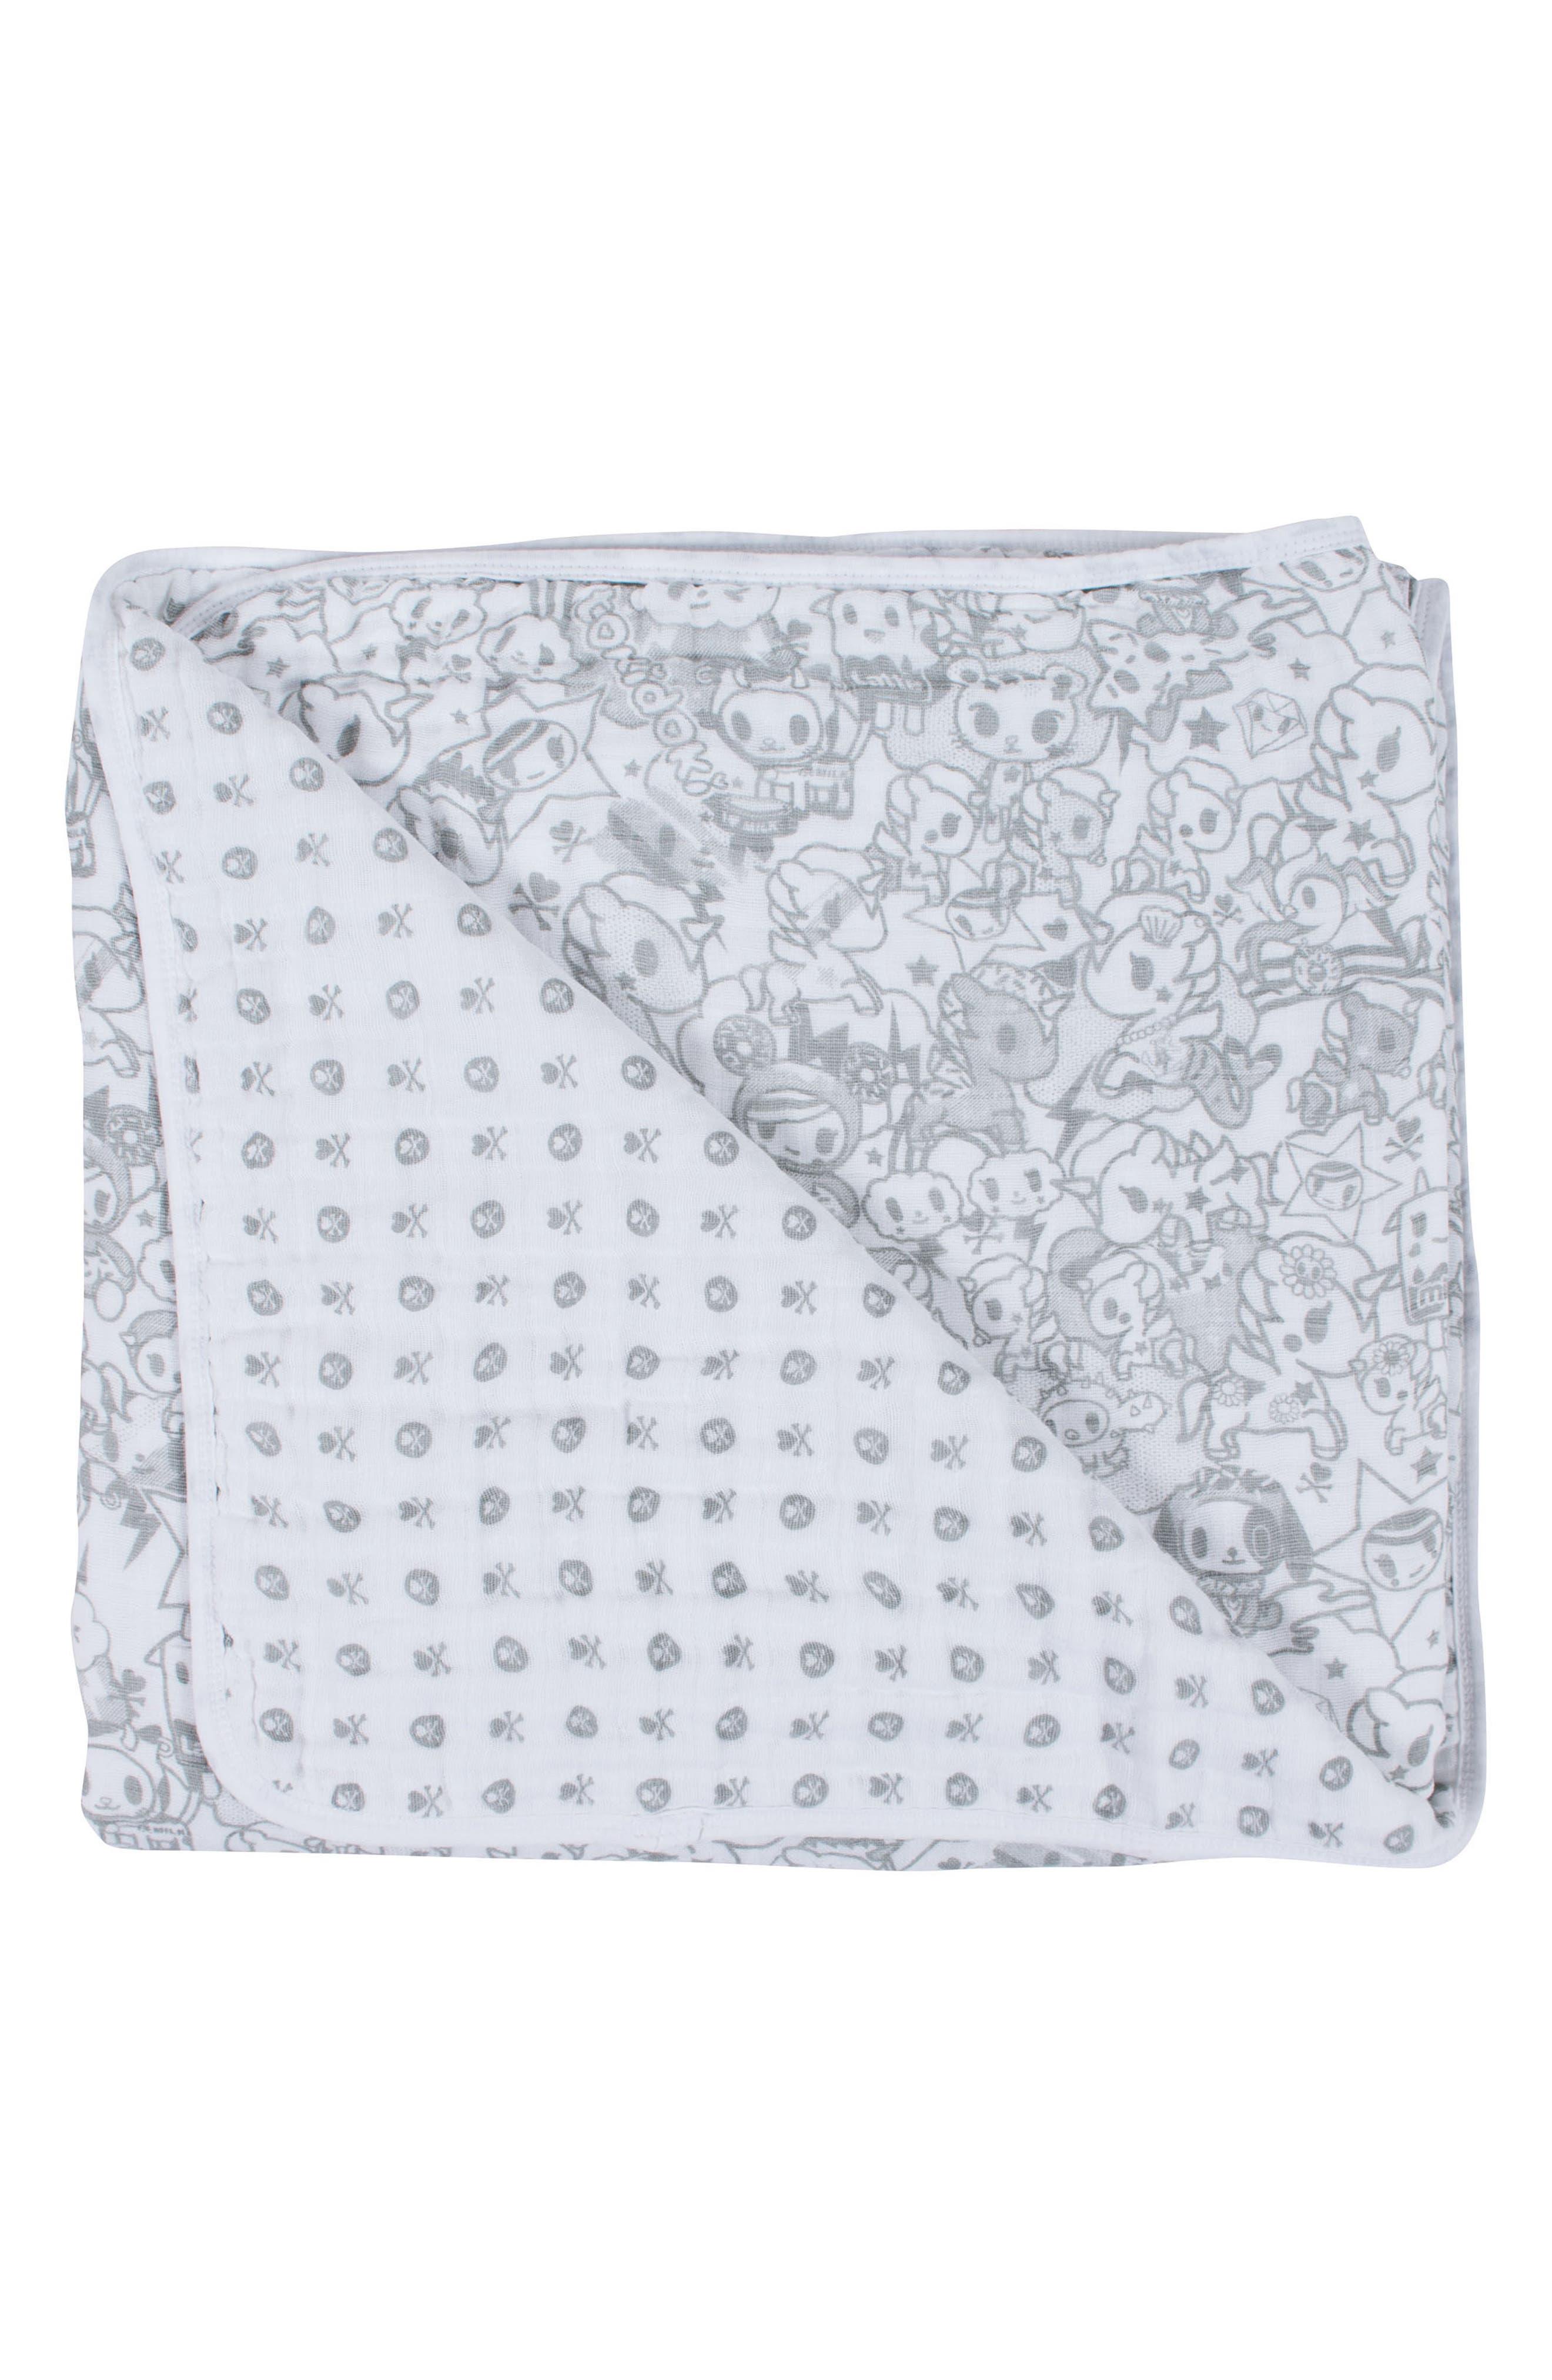 Print Cotton Muslin Blanket,                             Main thumbnail 1, color,                             050